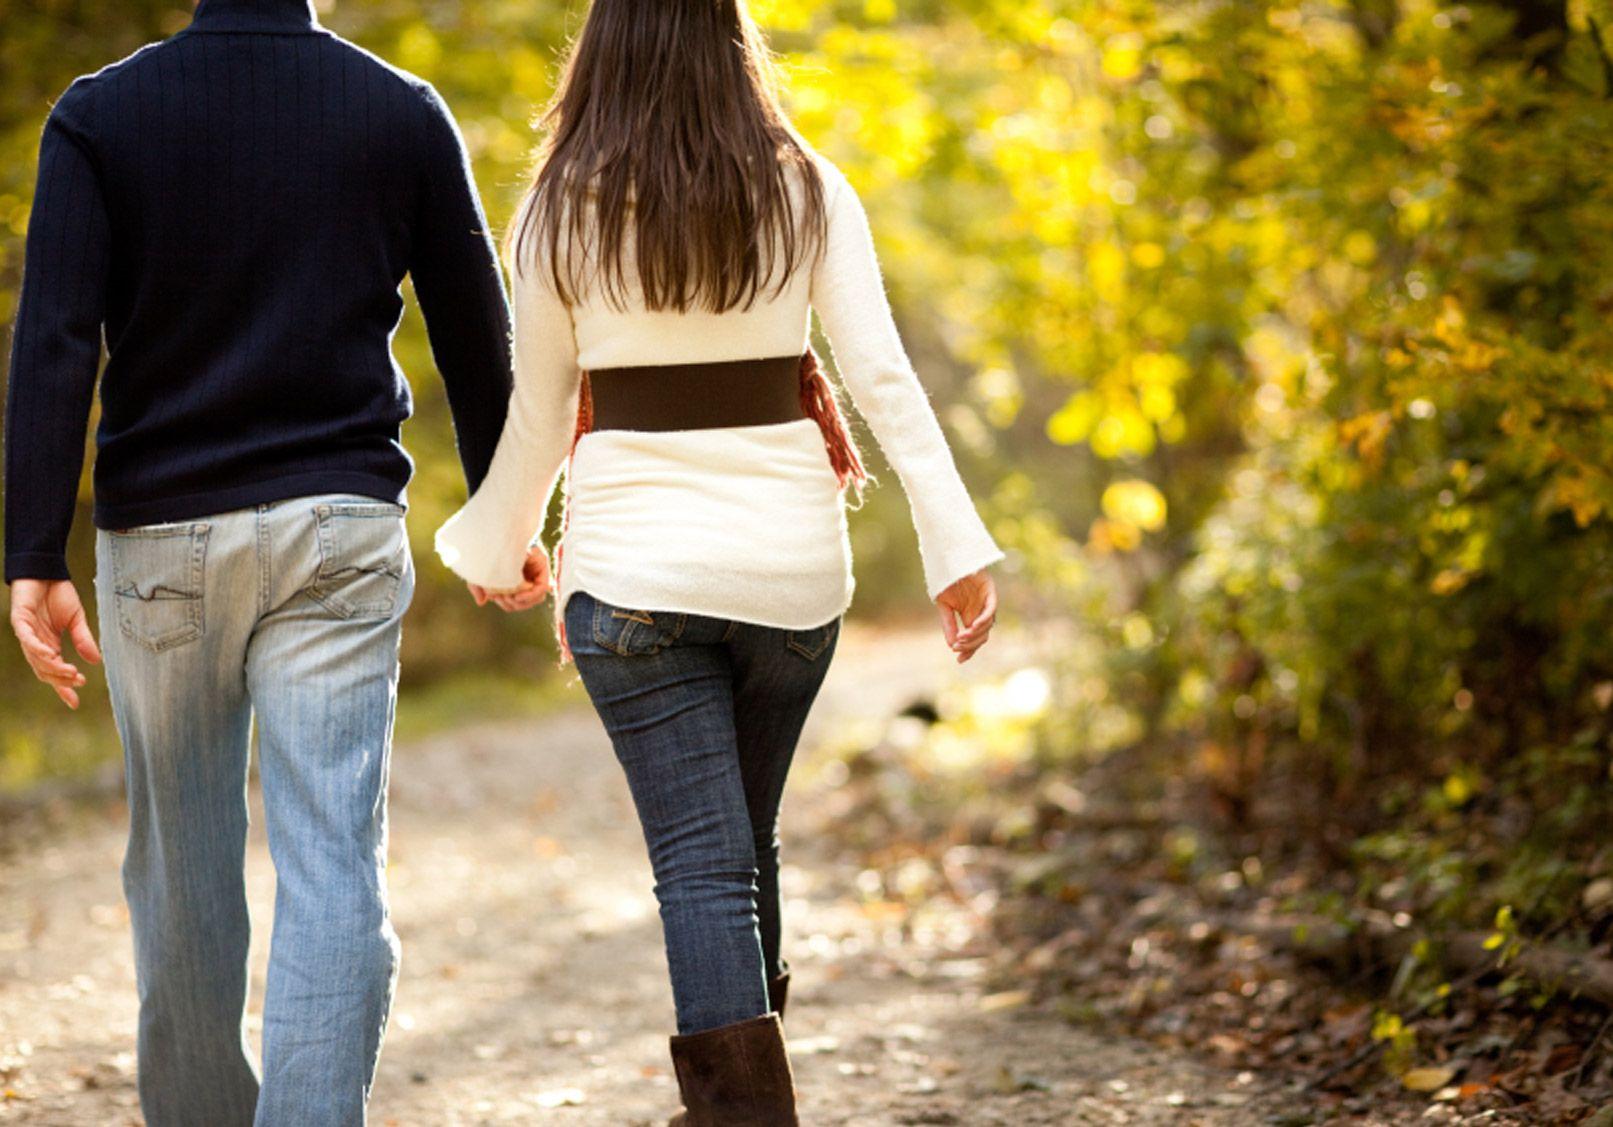 Source: www.theromantic.com